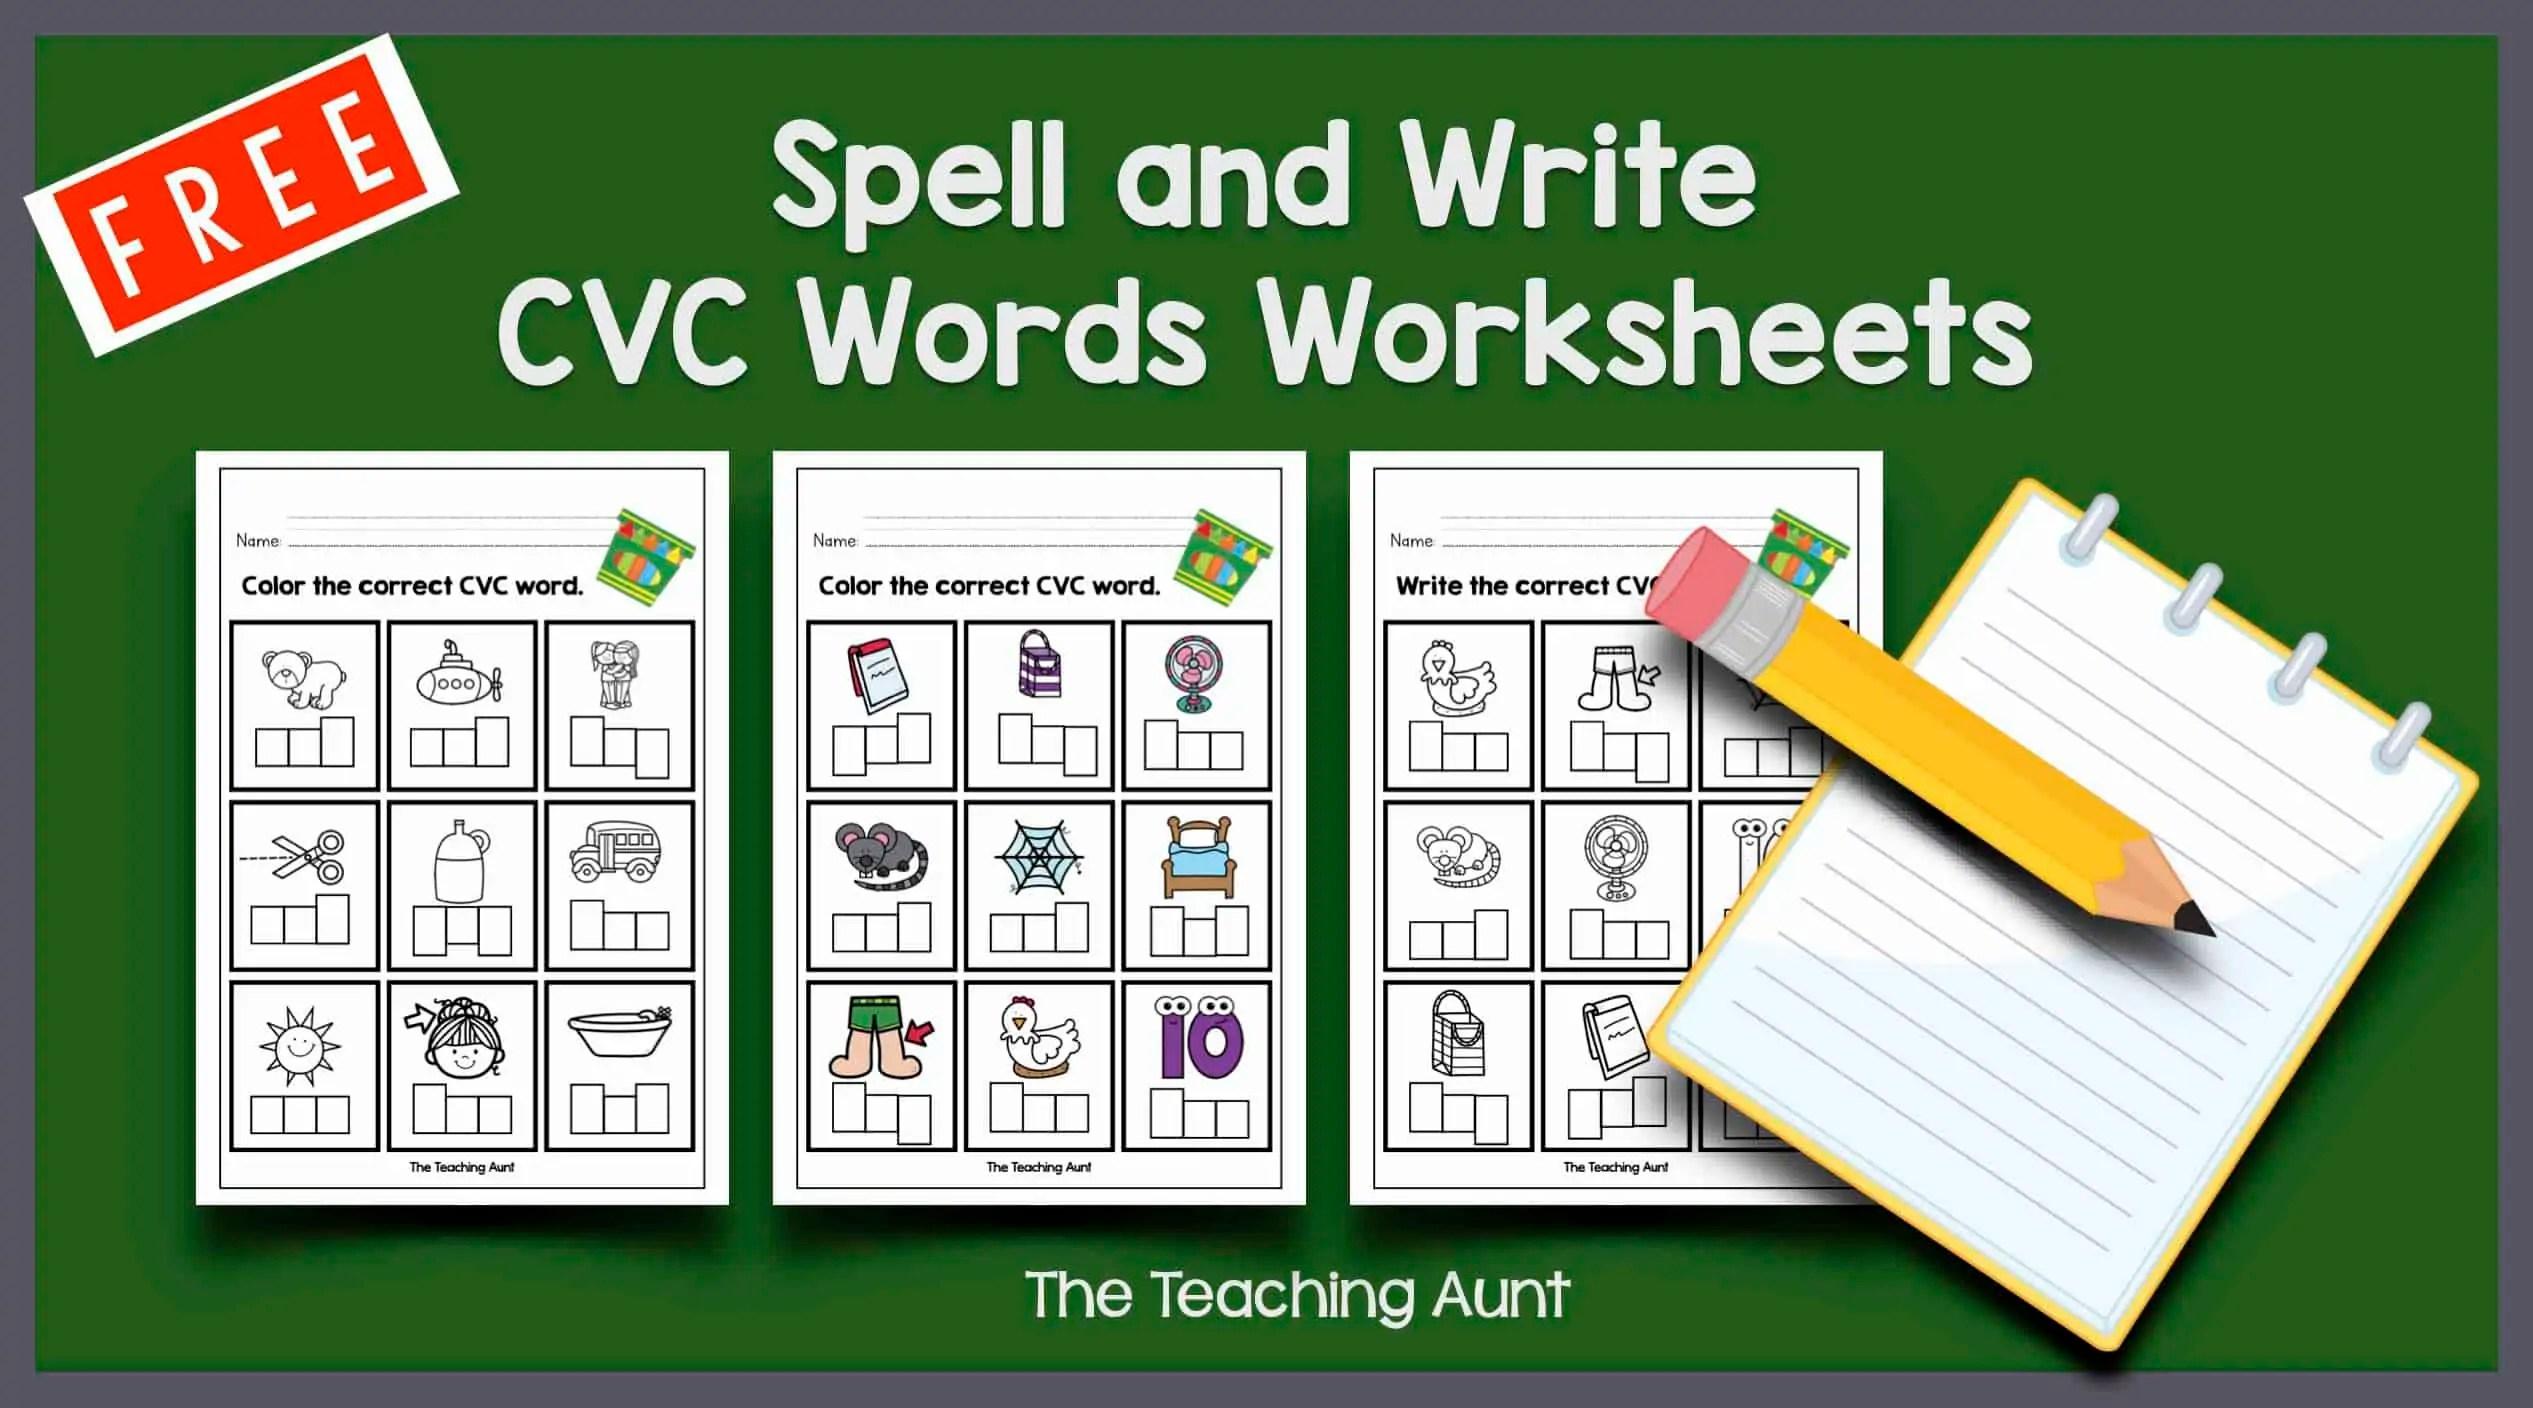 hight resolution of CVC Words Worksheets for Kindergarten. - The Teaching Aunt